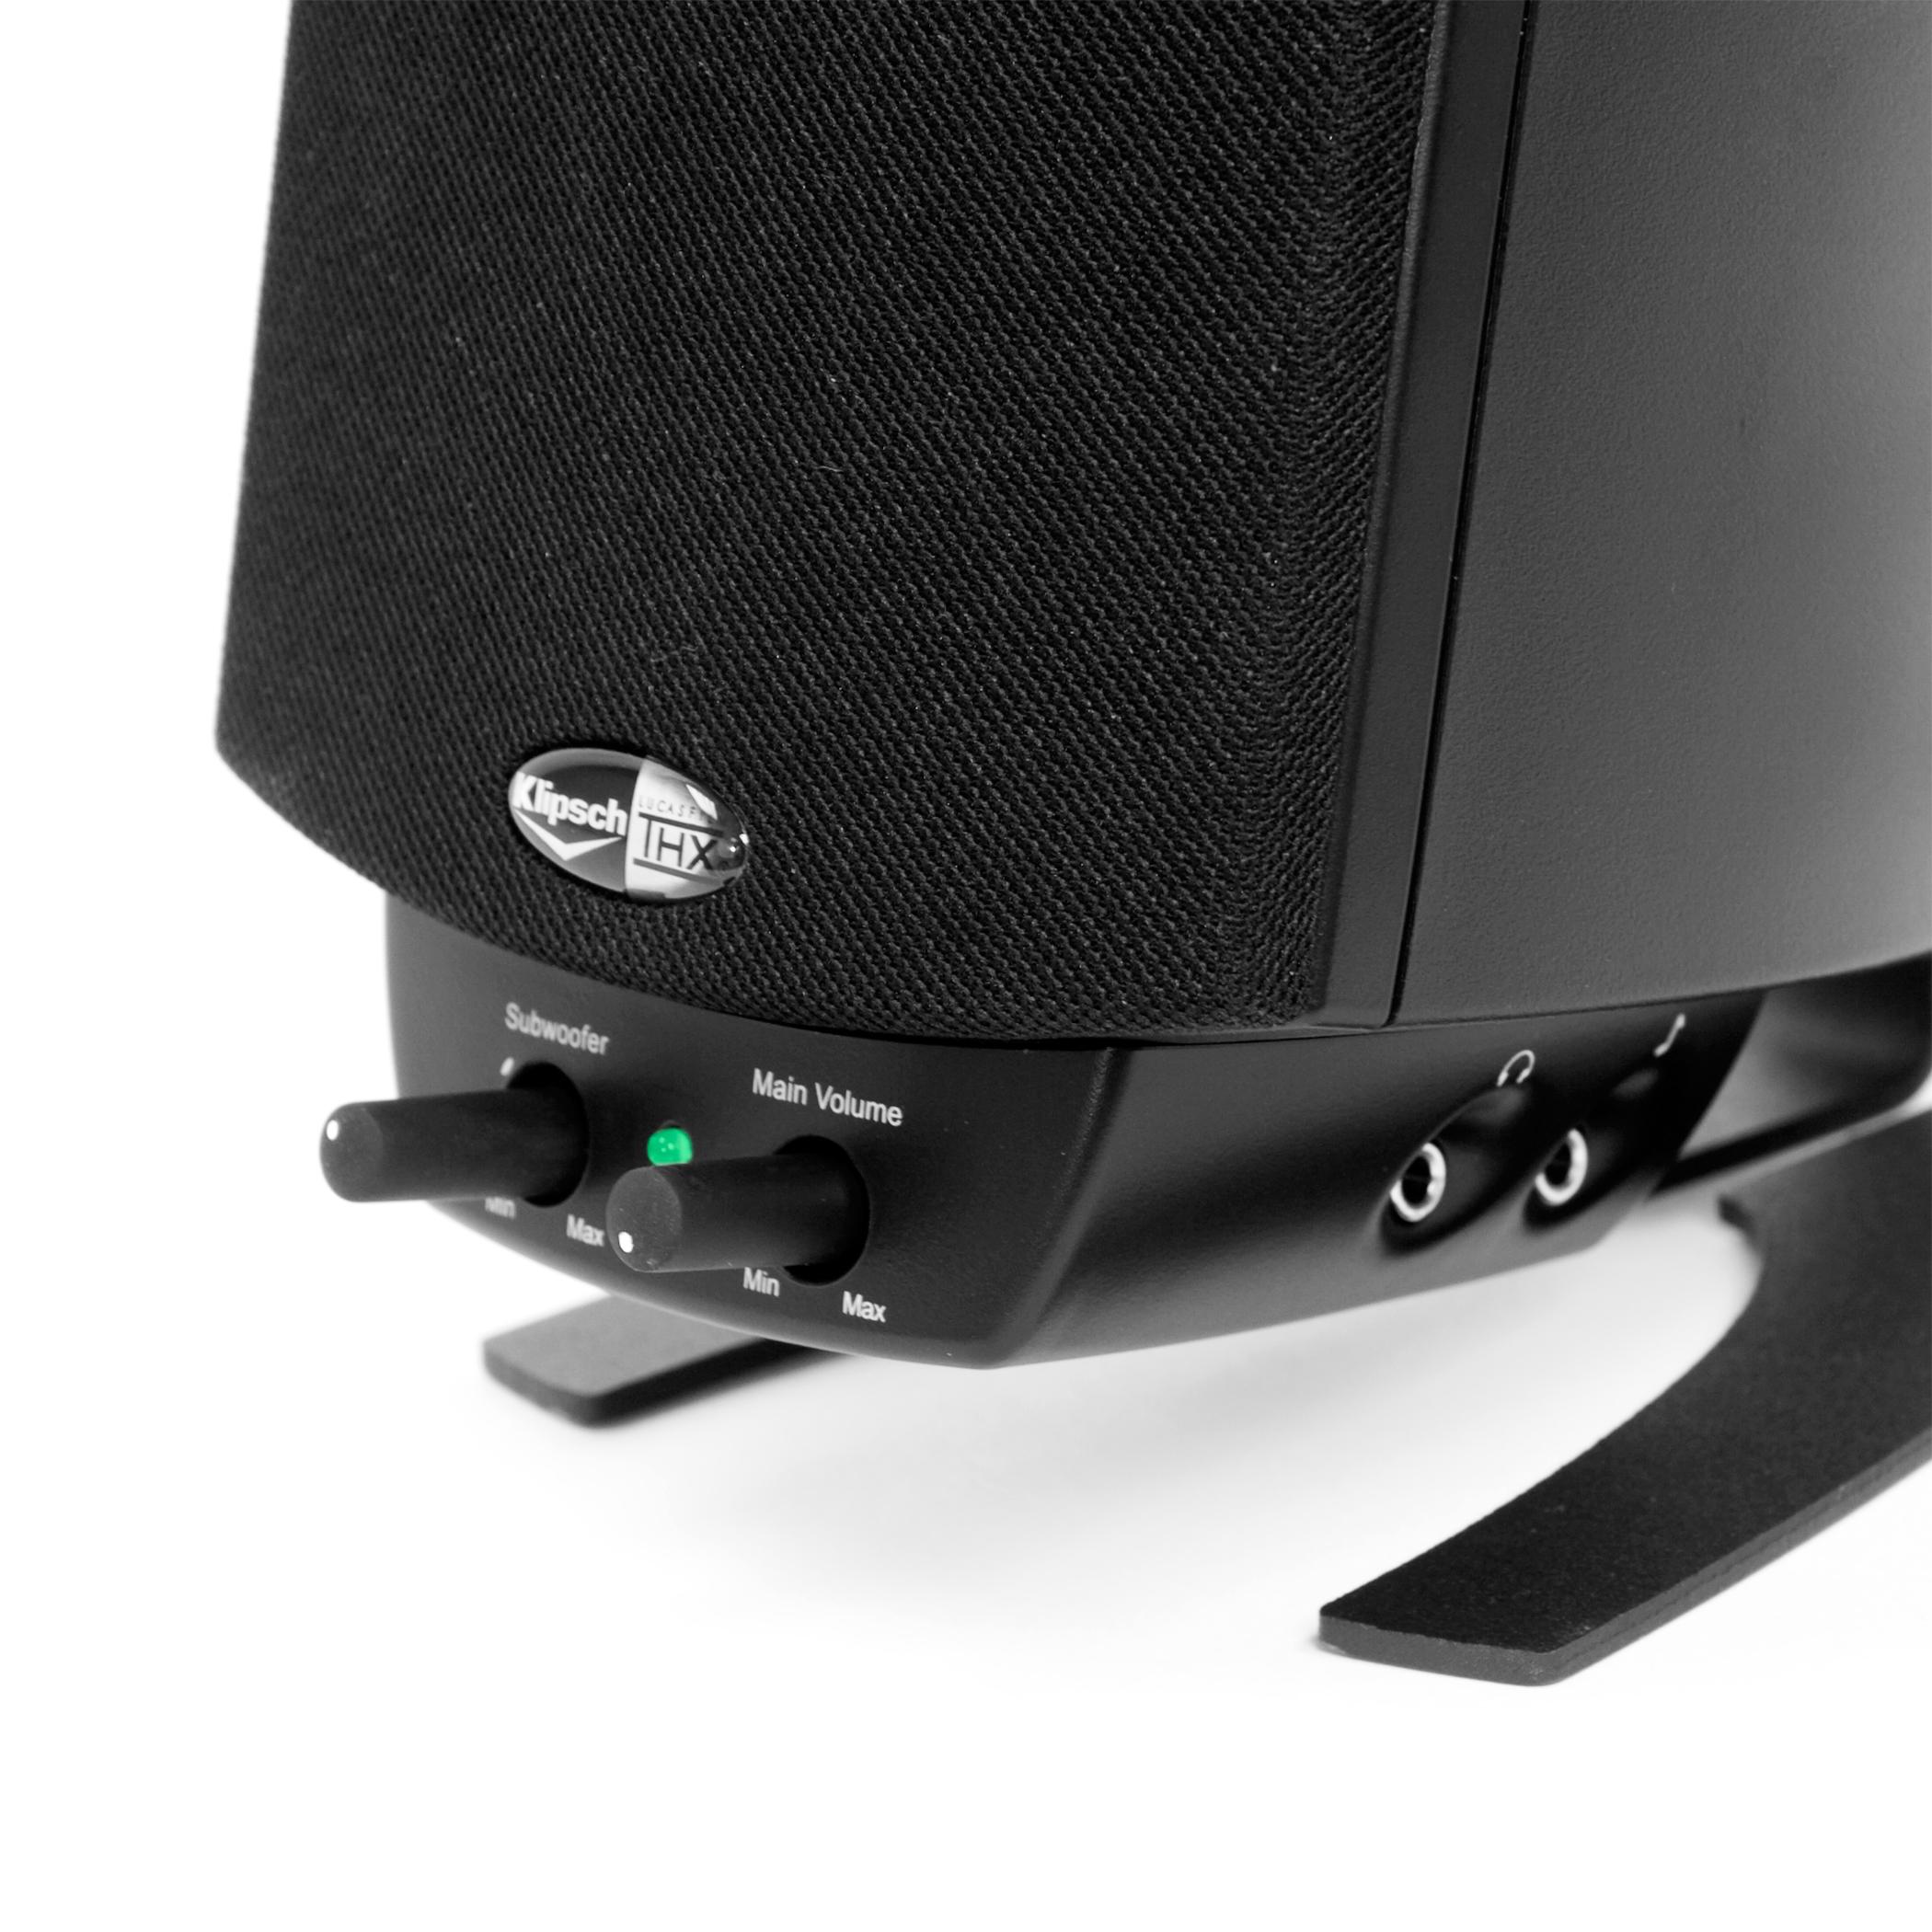 Klipsch Headphone Plug Wiring Diagram Library Speakers Classic Award Winning Sound Promedia 21 Wireless Computer